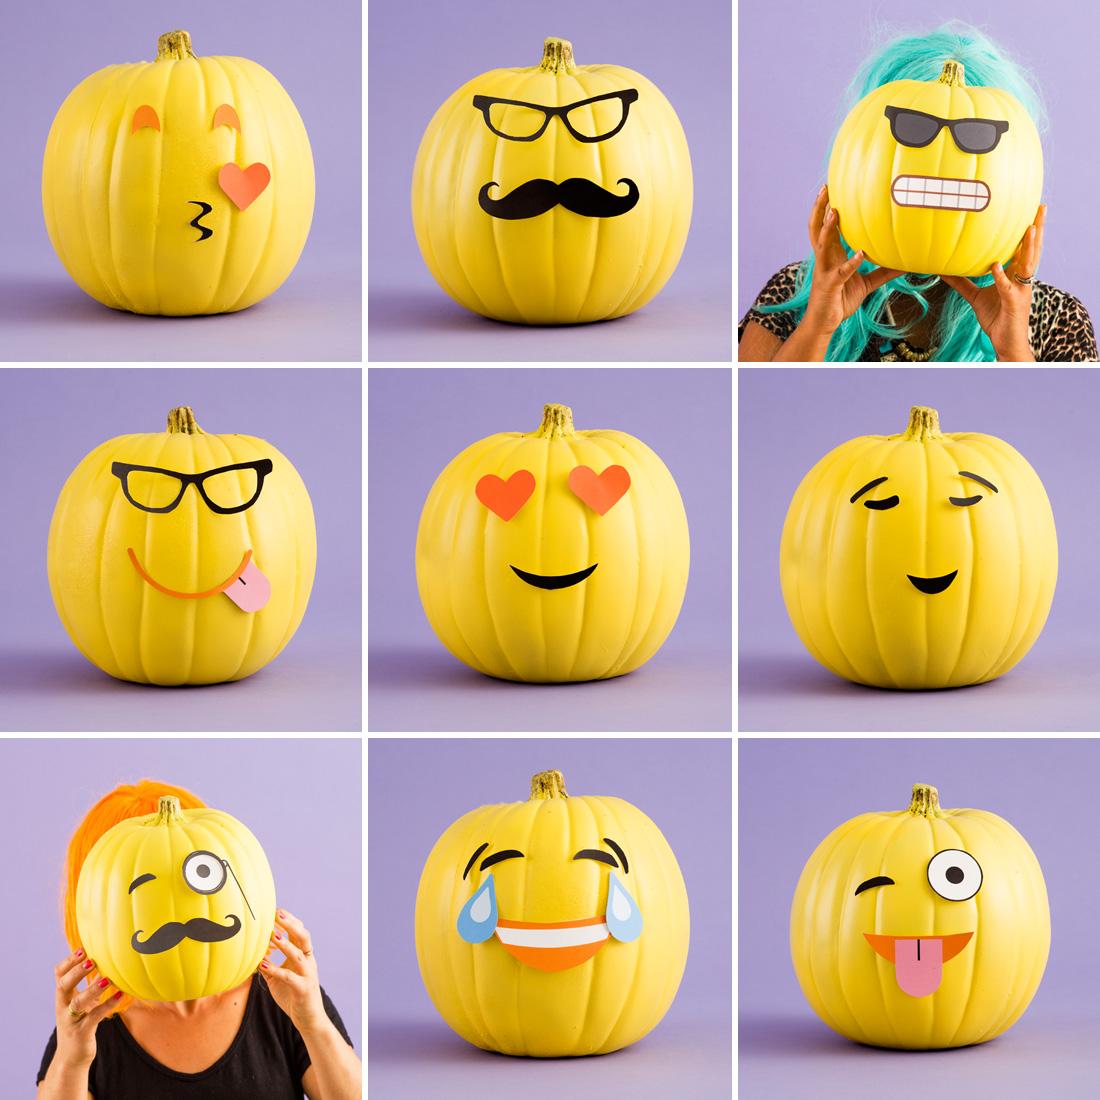 Make Diy Emoji Pumpkins With Our Free Printables